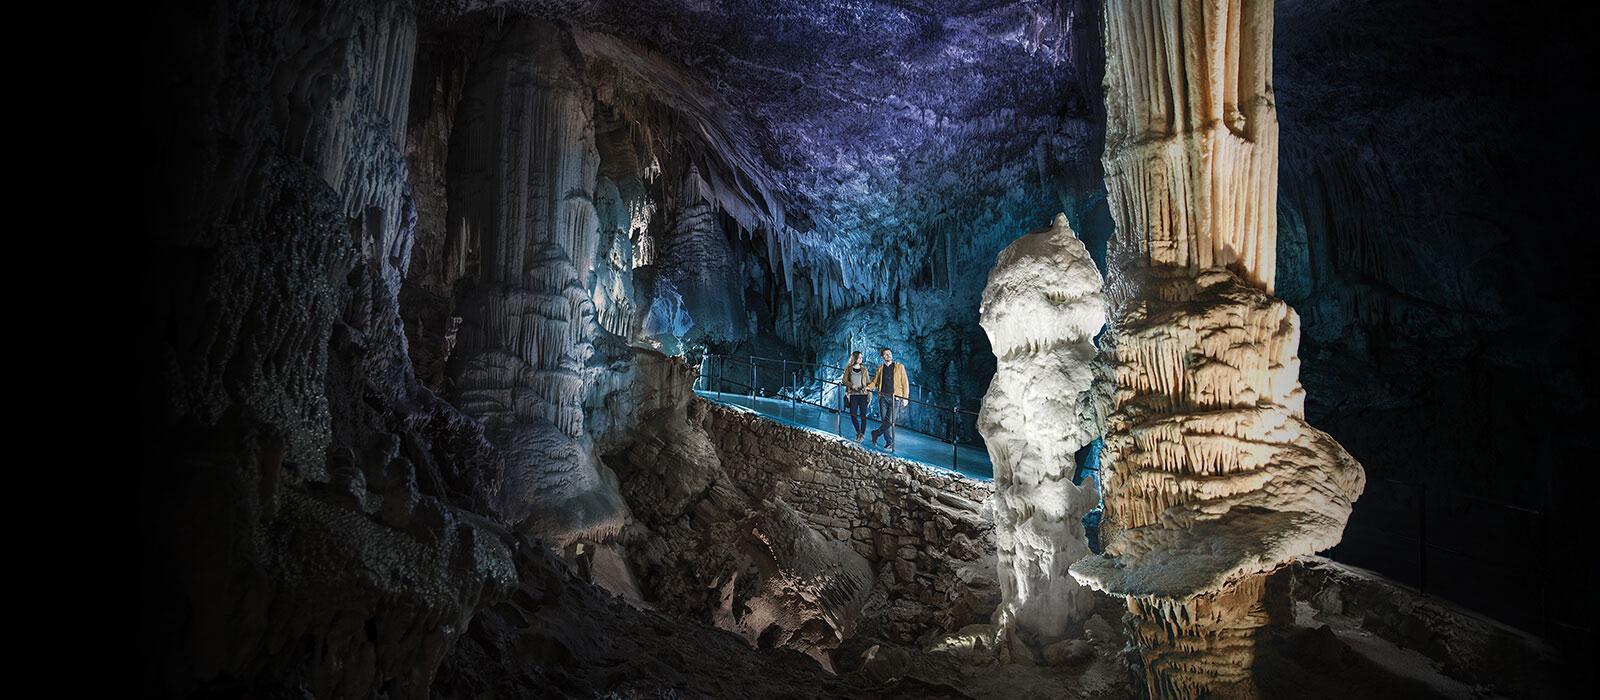 Rezultat iskanja slik za postojna cave